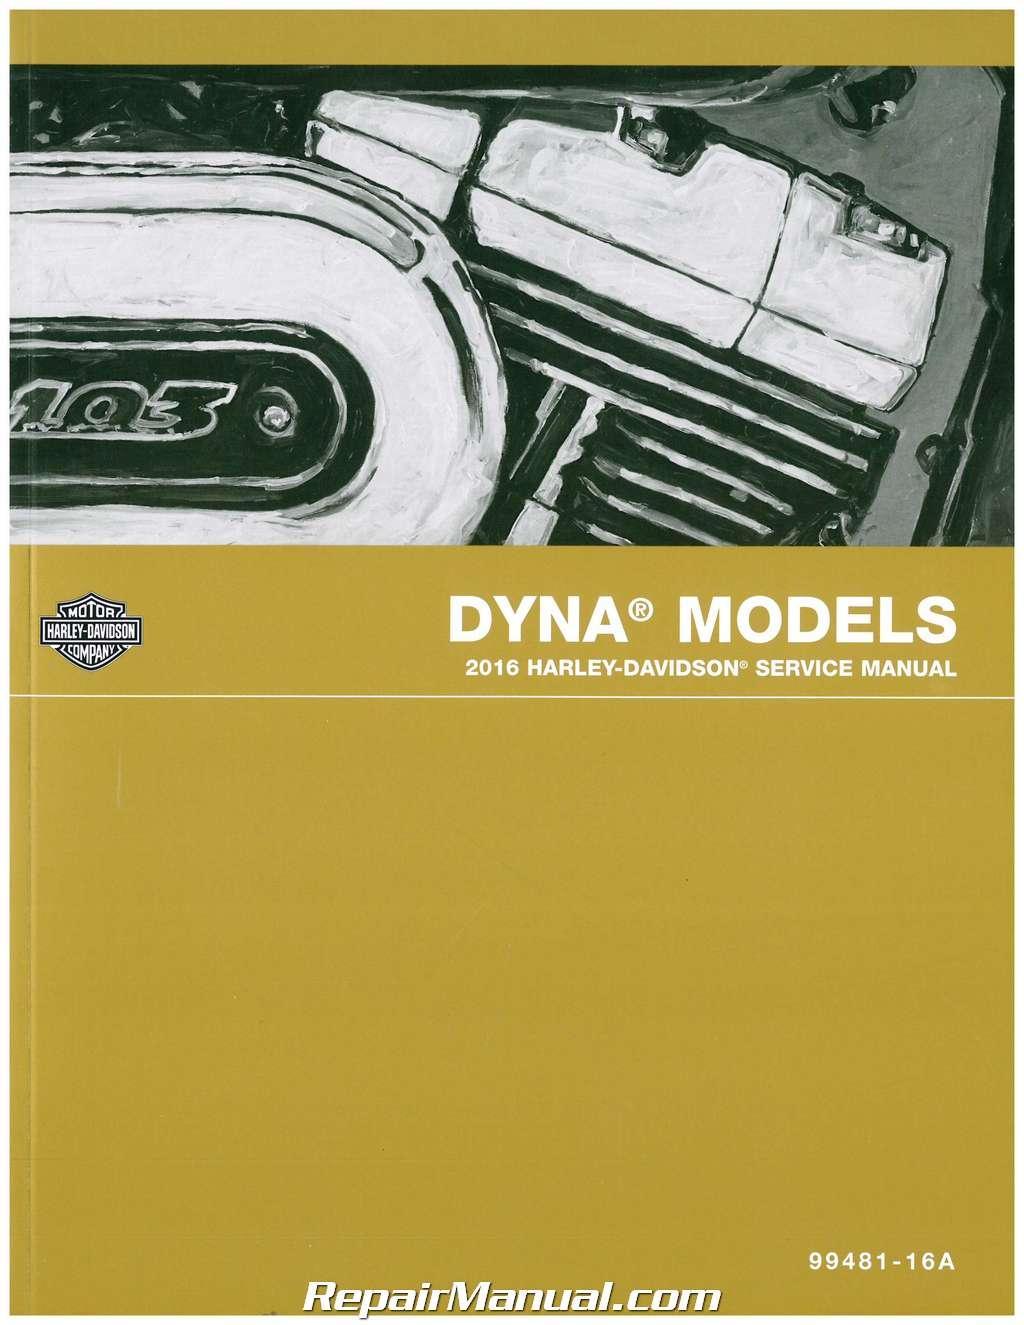 2016 Harley Davidson Dyna Motorcycle Service Manual